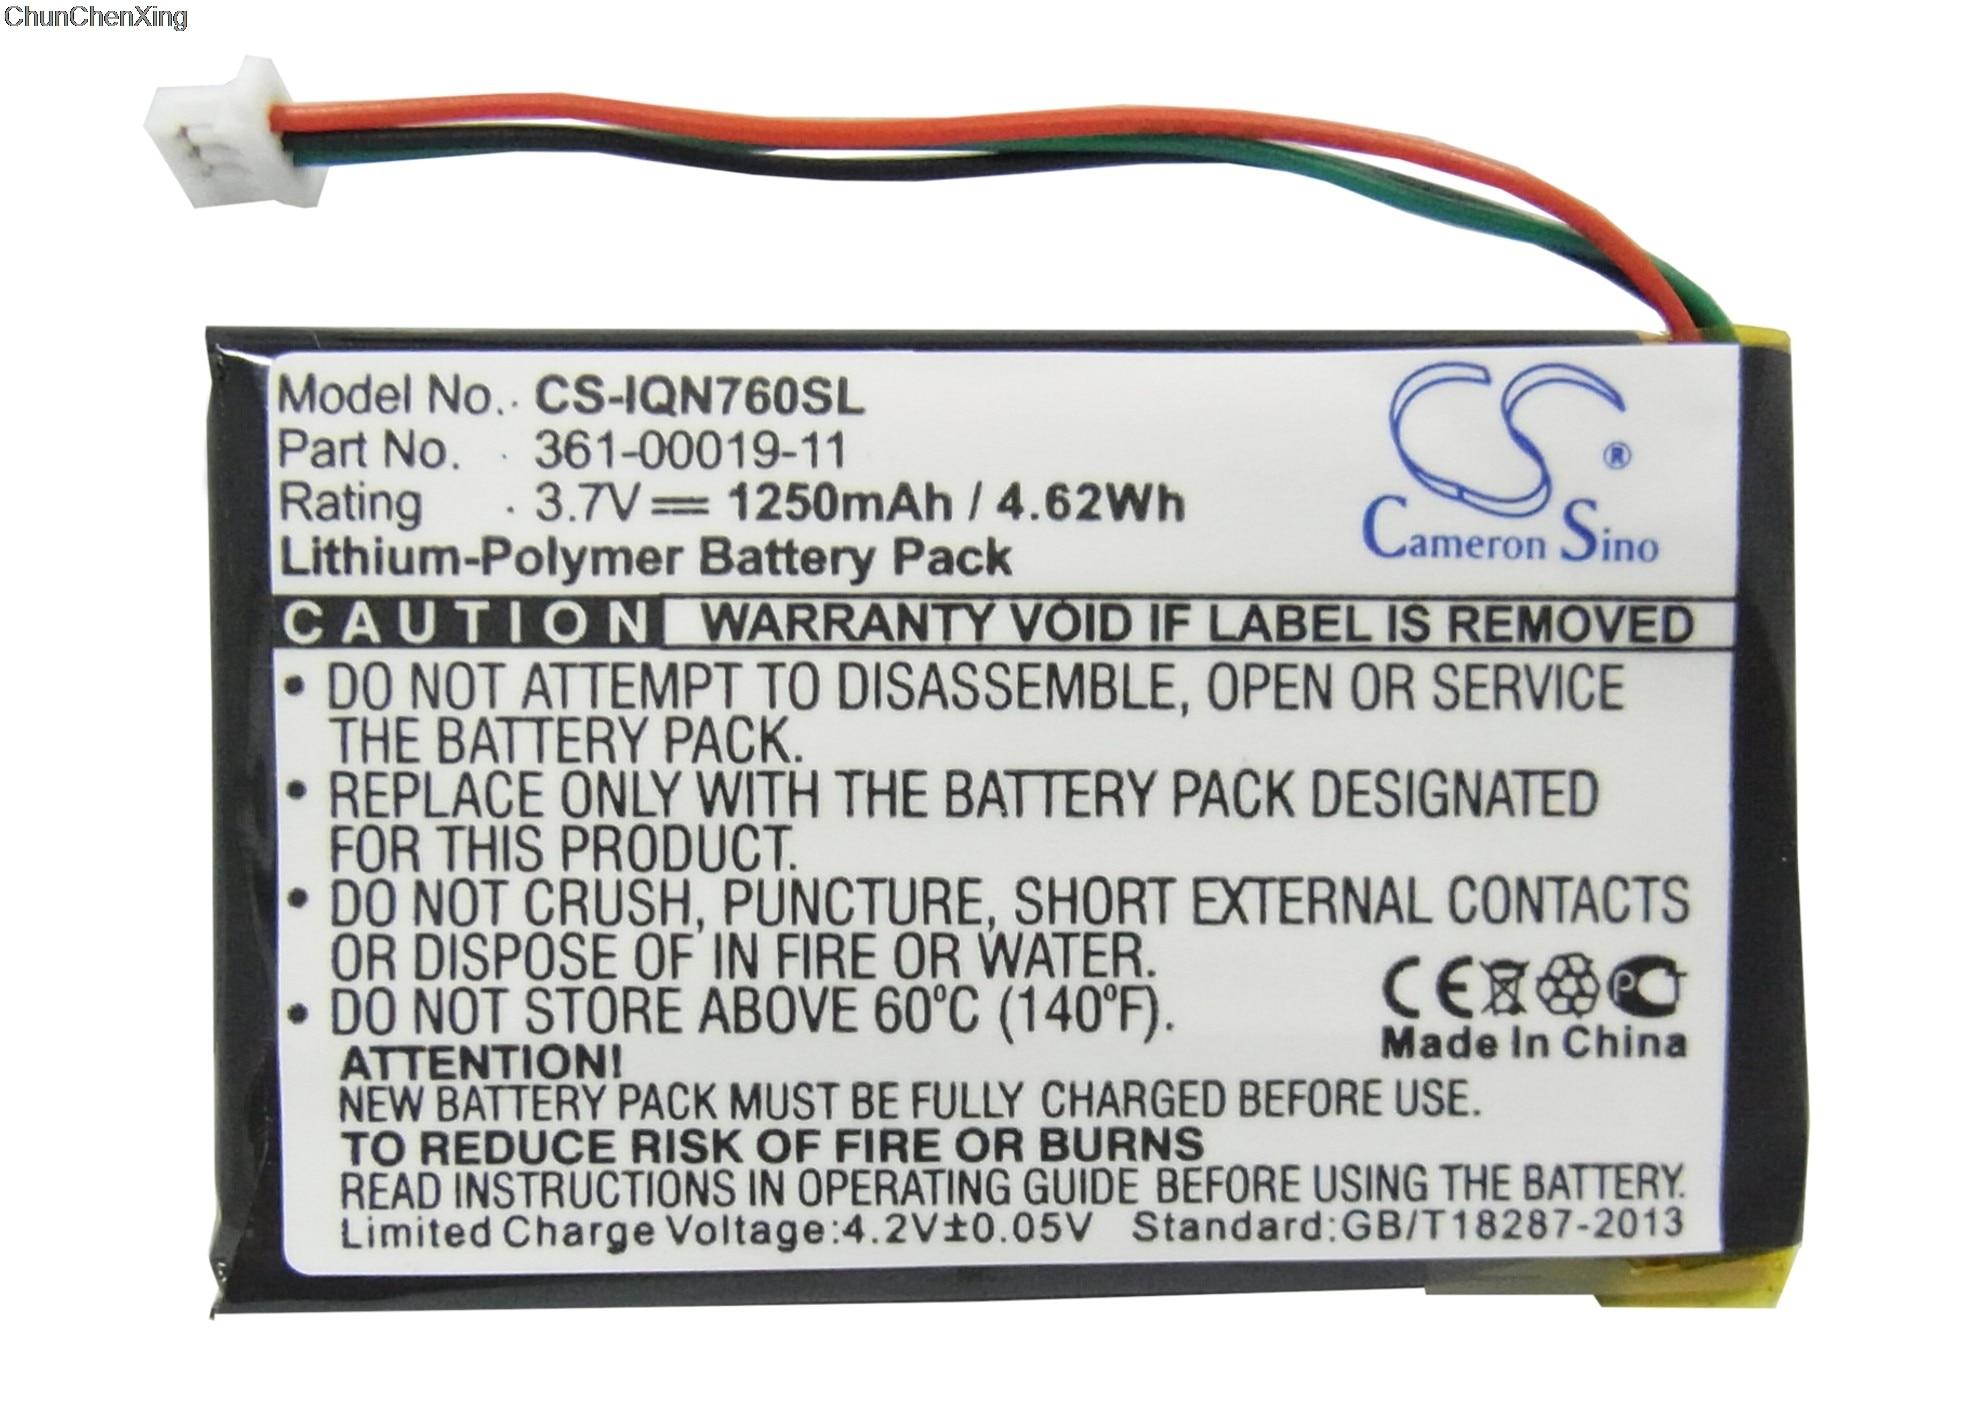 Cameron Sino 1250mAh Battery 361-00019-11 for Garmin Nuvi 3590, 3590LMT, 700 ( 3 wires ), 710, 710T, 760, 760T, 765, 765TCameron Sino 1250mAh Battery 361-00019-11 for Garmin Nuvi 3590, 3590LMT, 700 ( 3 wires ), 710, 710T, 760, 760T, 765, 765T